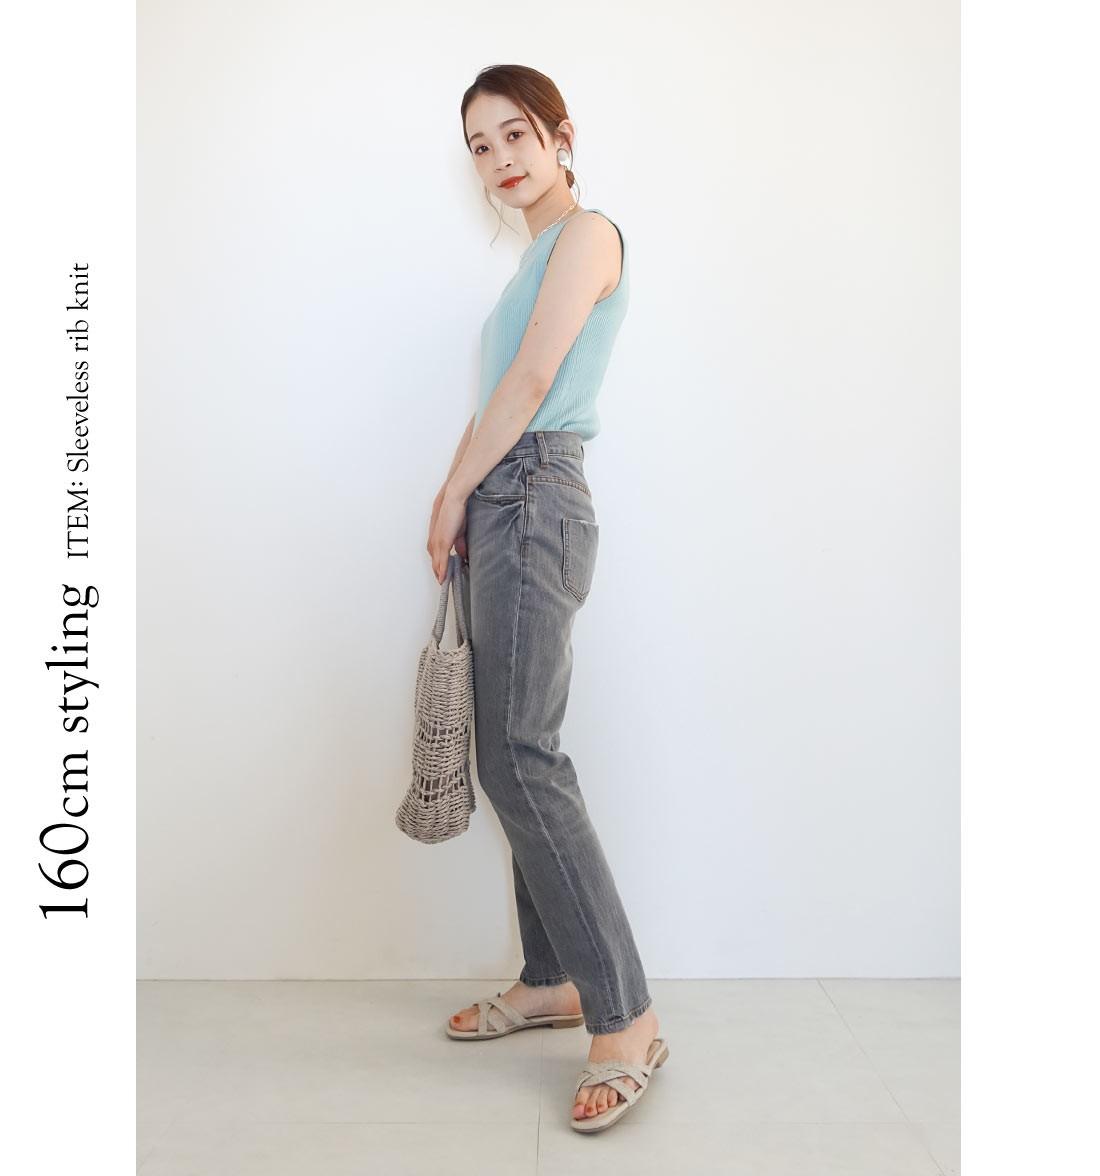 160cm styling ITEM: Sleeveless rib knit